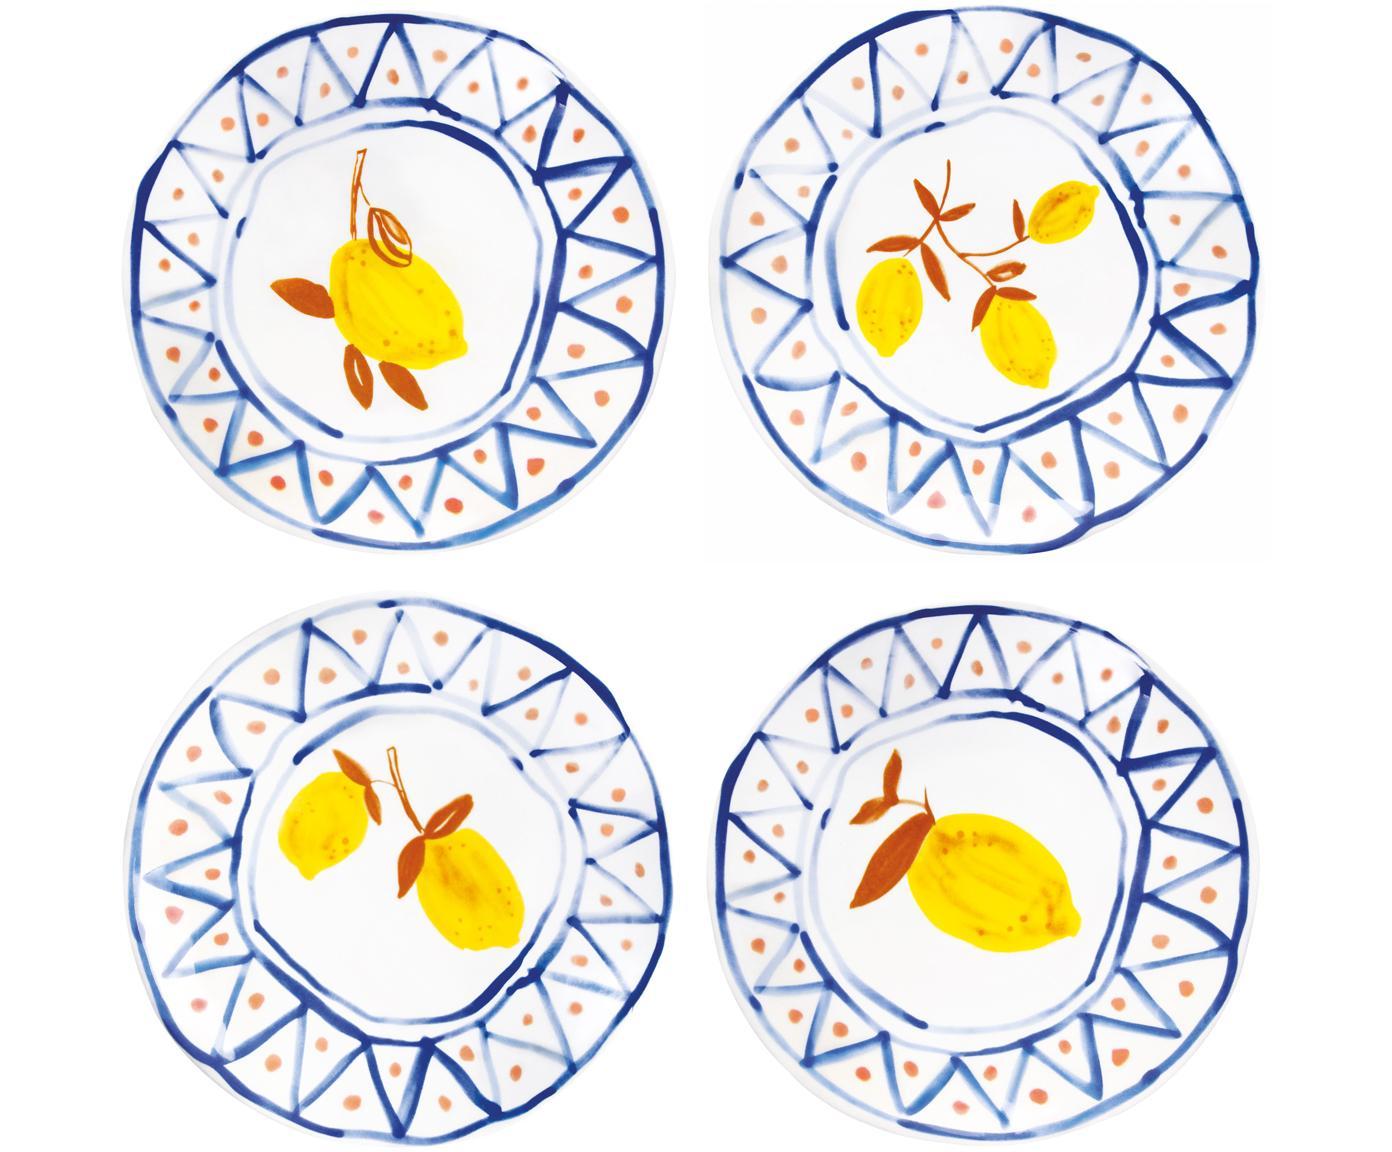 Set de platos pan Lemon Moroccan, 4pzas., Gres, Blanco, azul, naranja, amarillo, Ø 16 cm